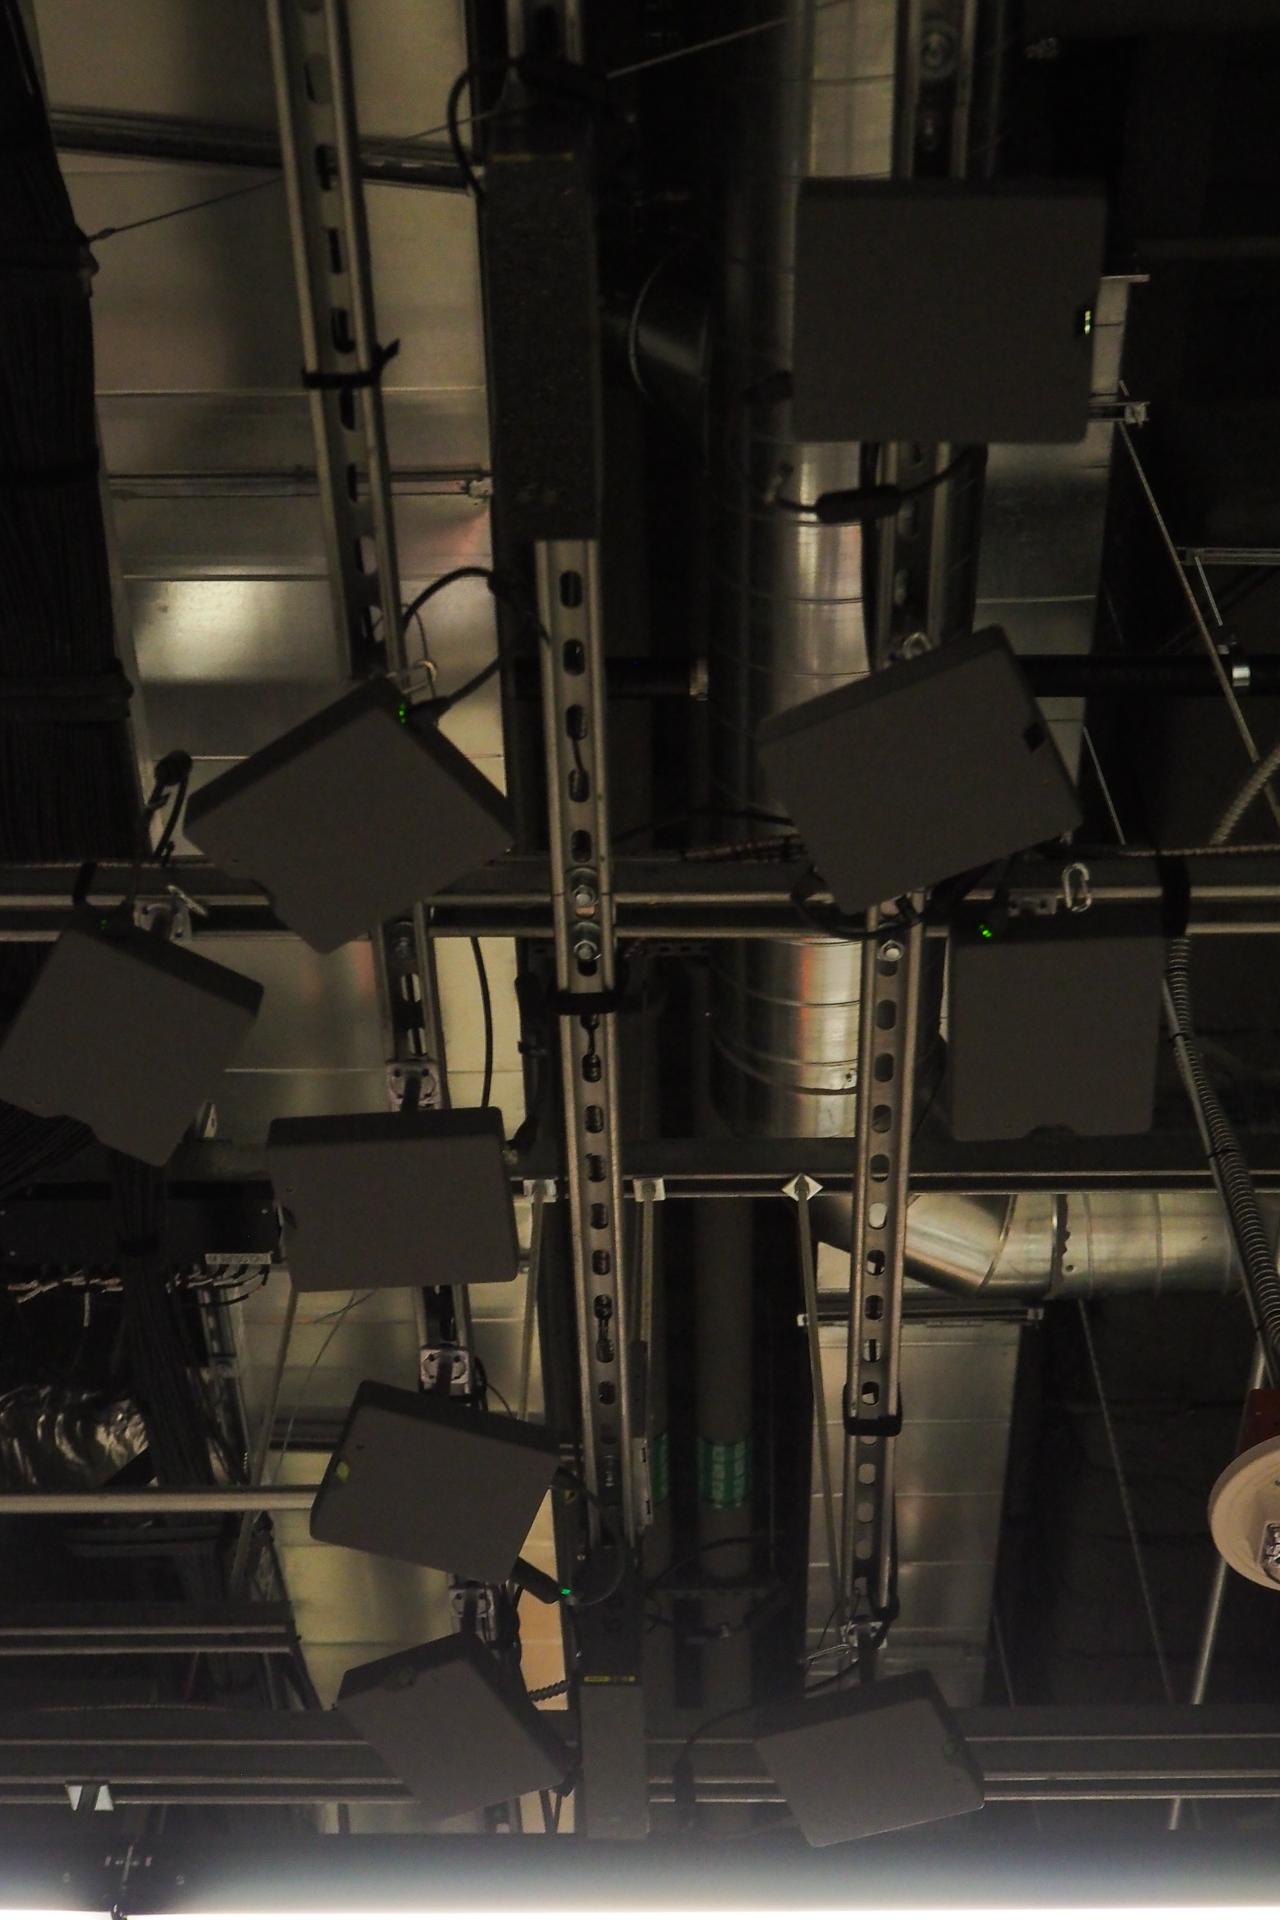 Inside Amazon S Surveillance Powered No Checkout Convenience